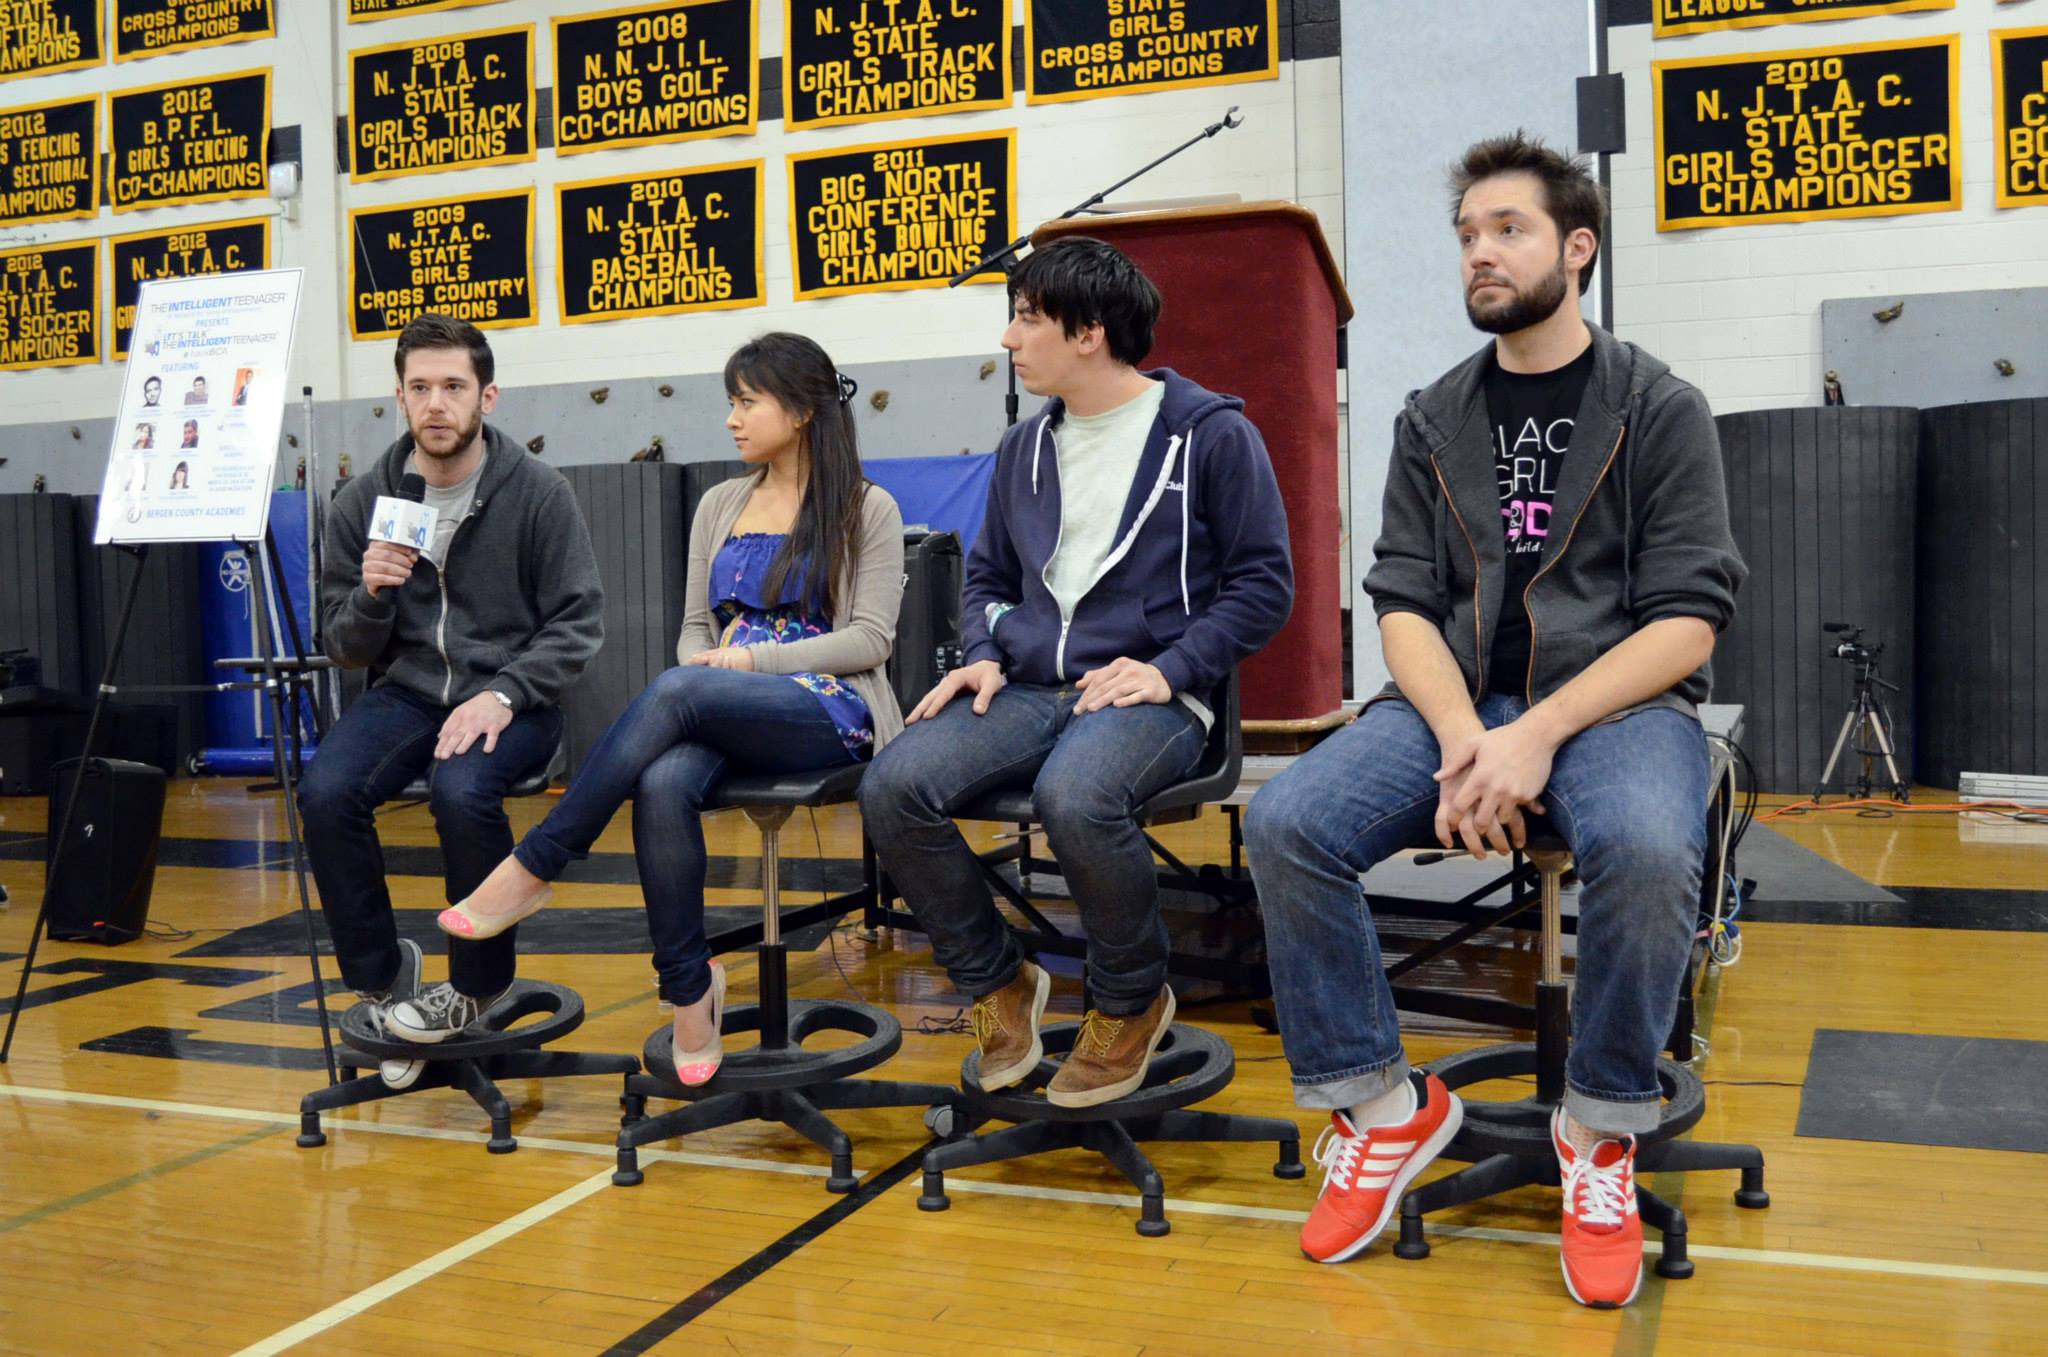 Judges: Colin Kroll, Rebecca Garcia, Mattan Griffel, Alexis Ohanian